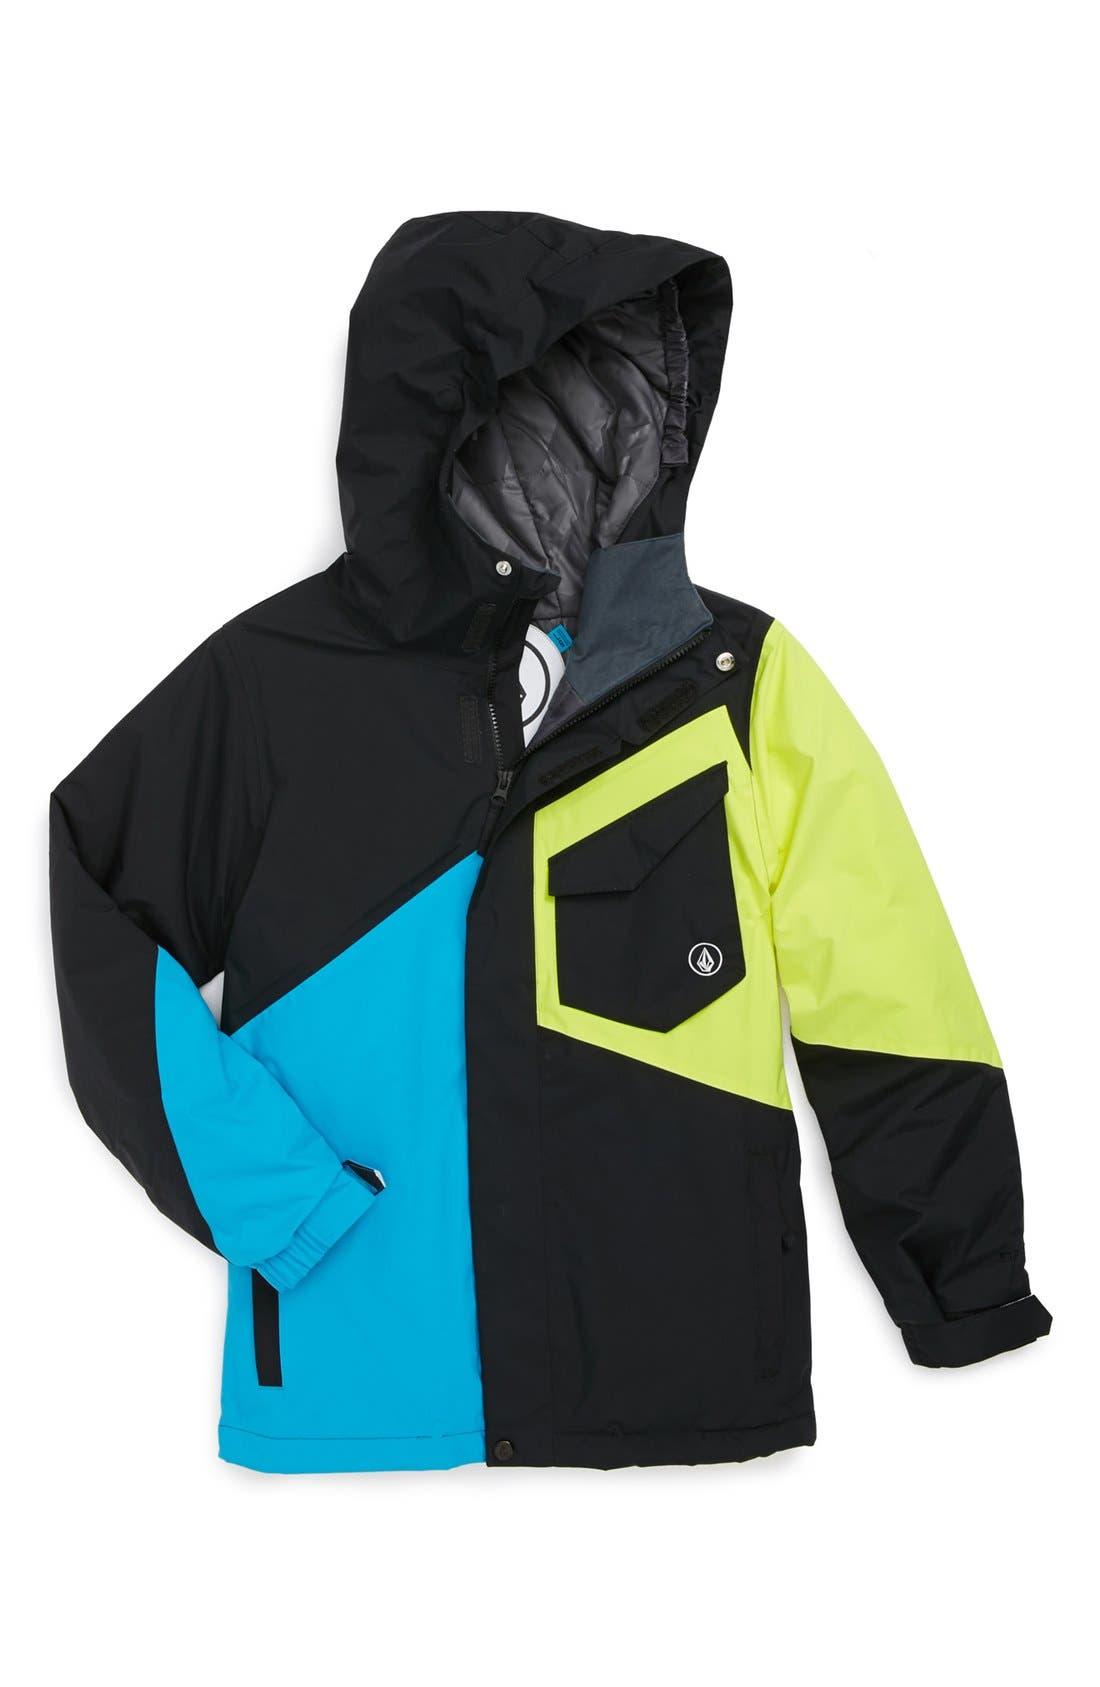 Alternate Image 1 Selected - Volcom 'Ace' Insulated Jacket (Little Boys & Big Boys)